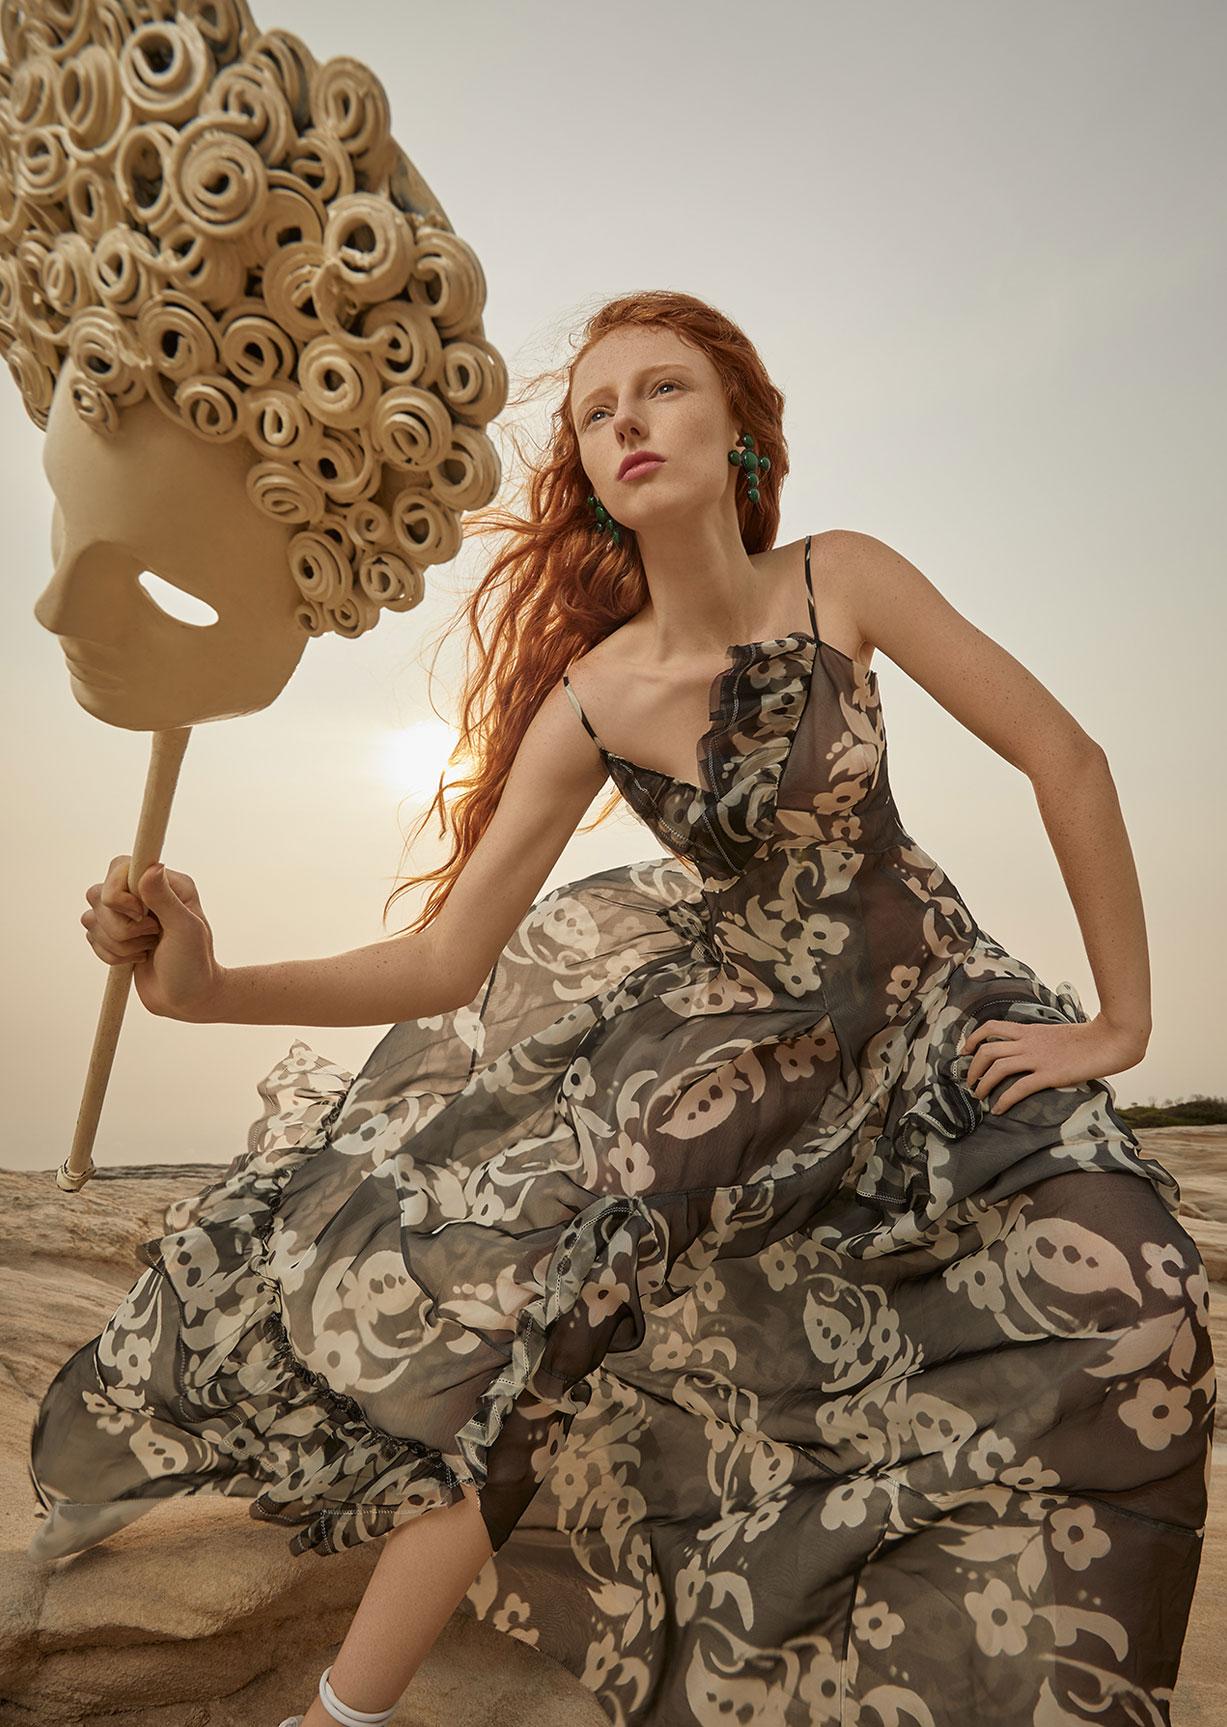 Модный маскарад в журнале Grazia / фото 14